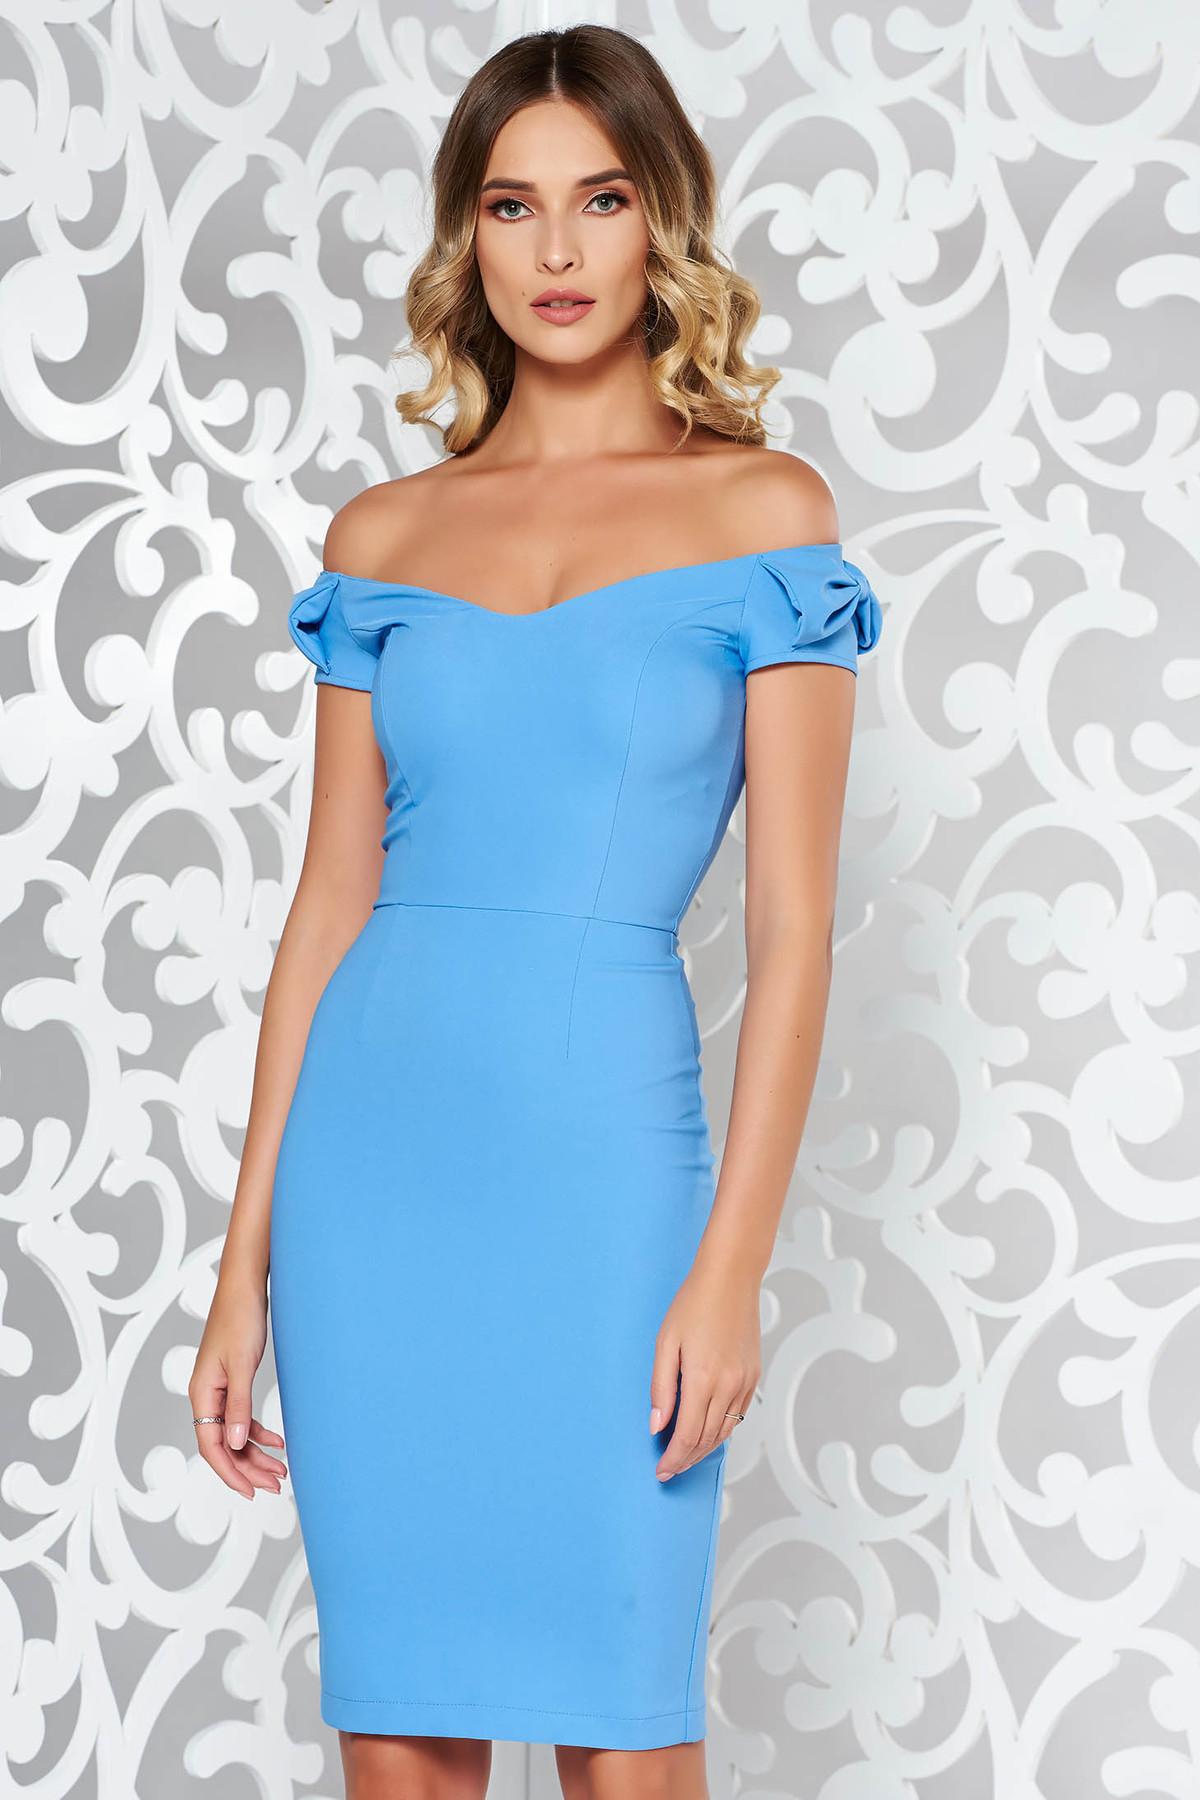 Rochie StarShinerS albastra-deschis eleganta tip creion din stofa subtire usor elastica cu umeri goi